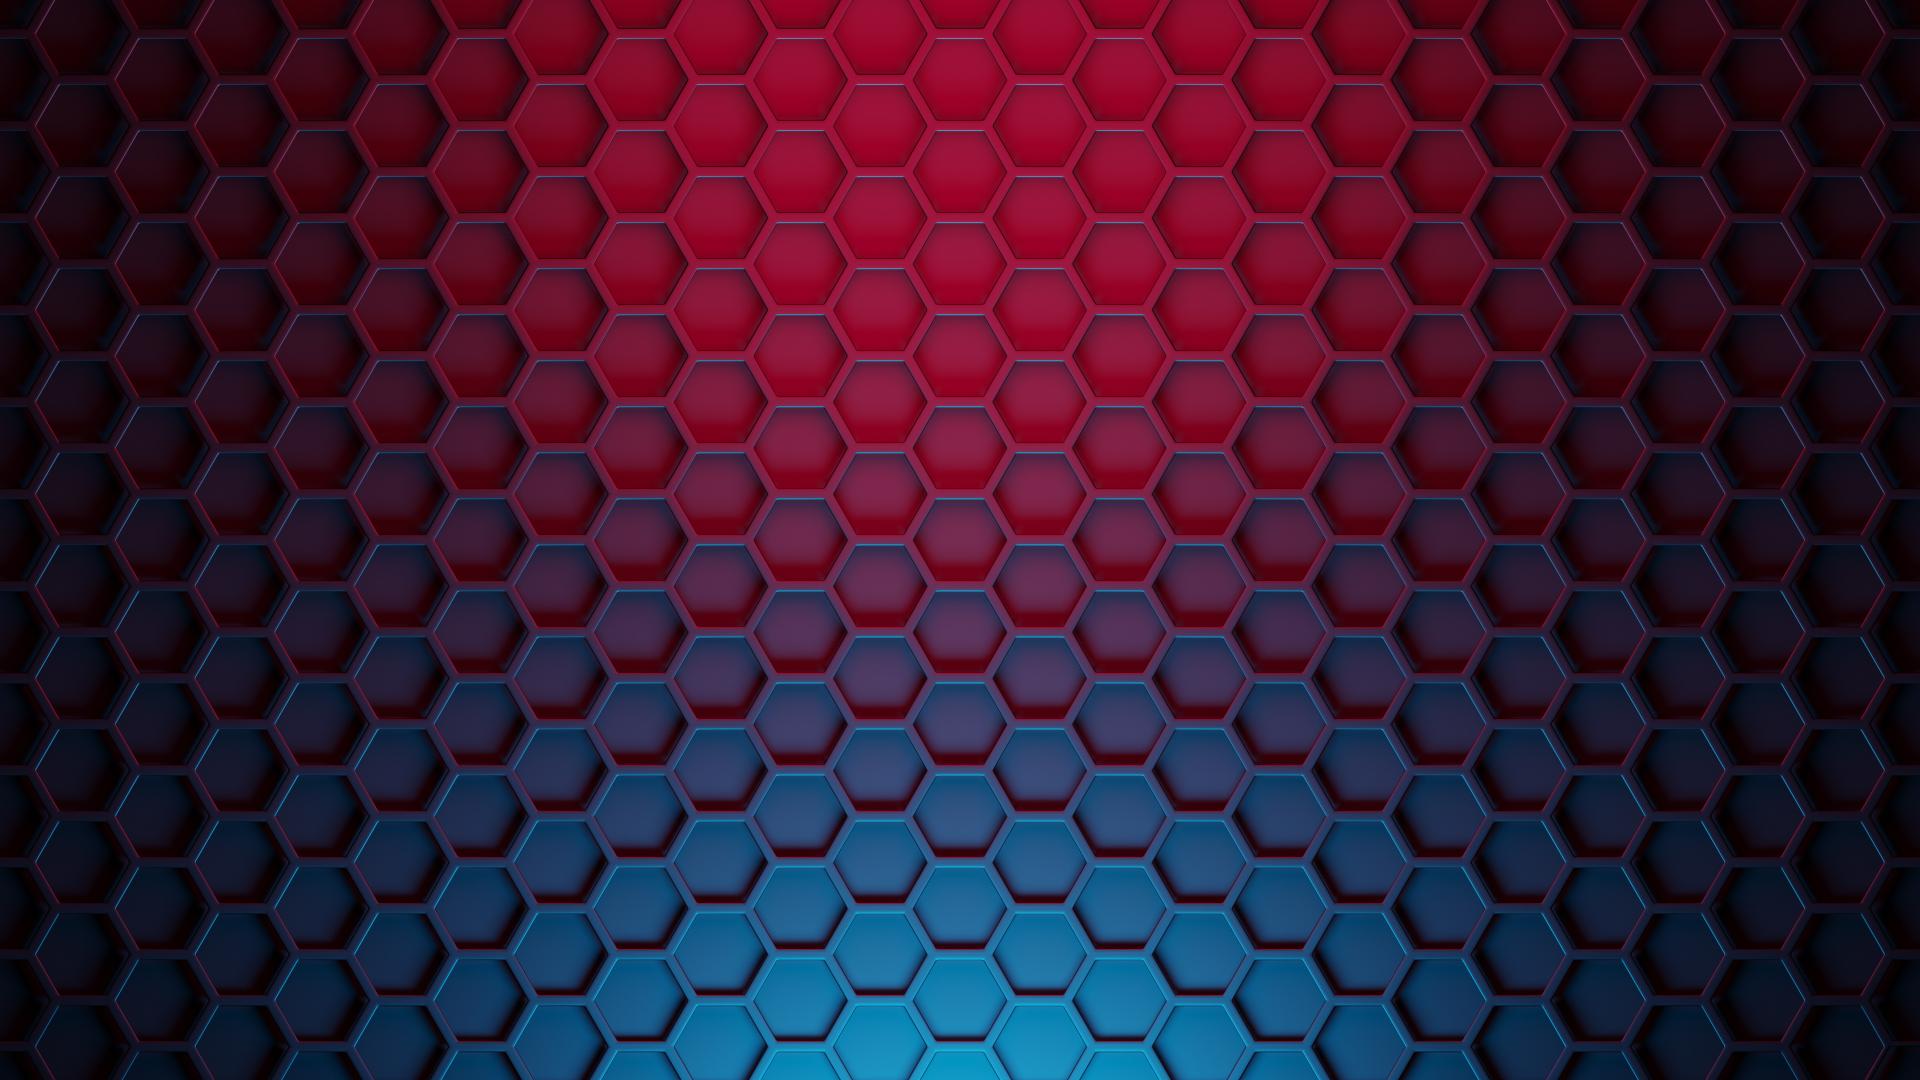 1920x1080 Hexagon 3D Pattern 1080P Laptop Full HD ...